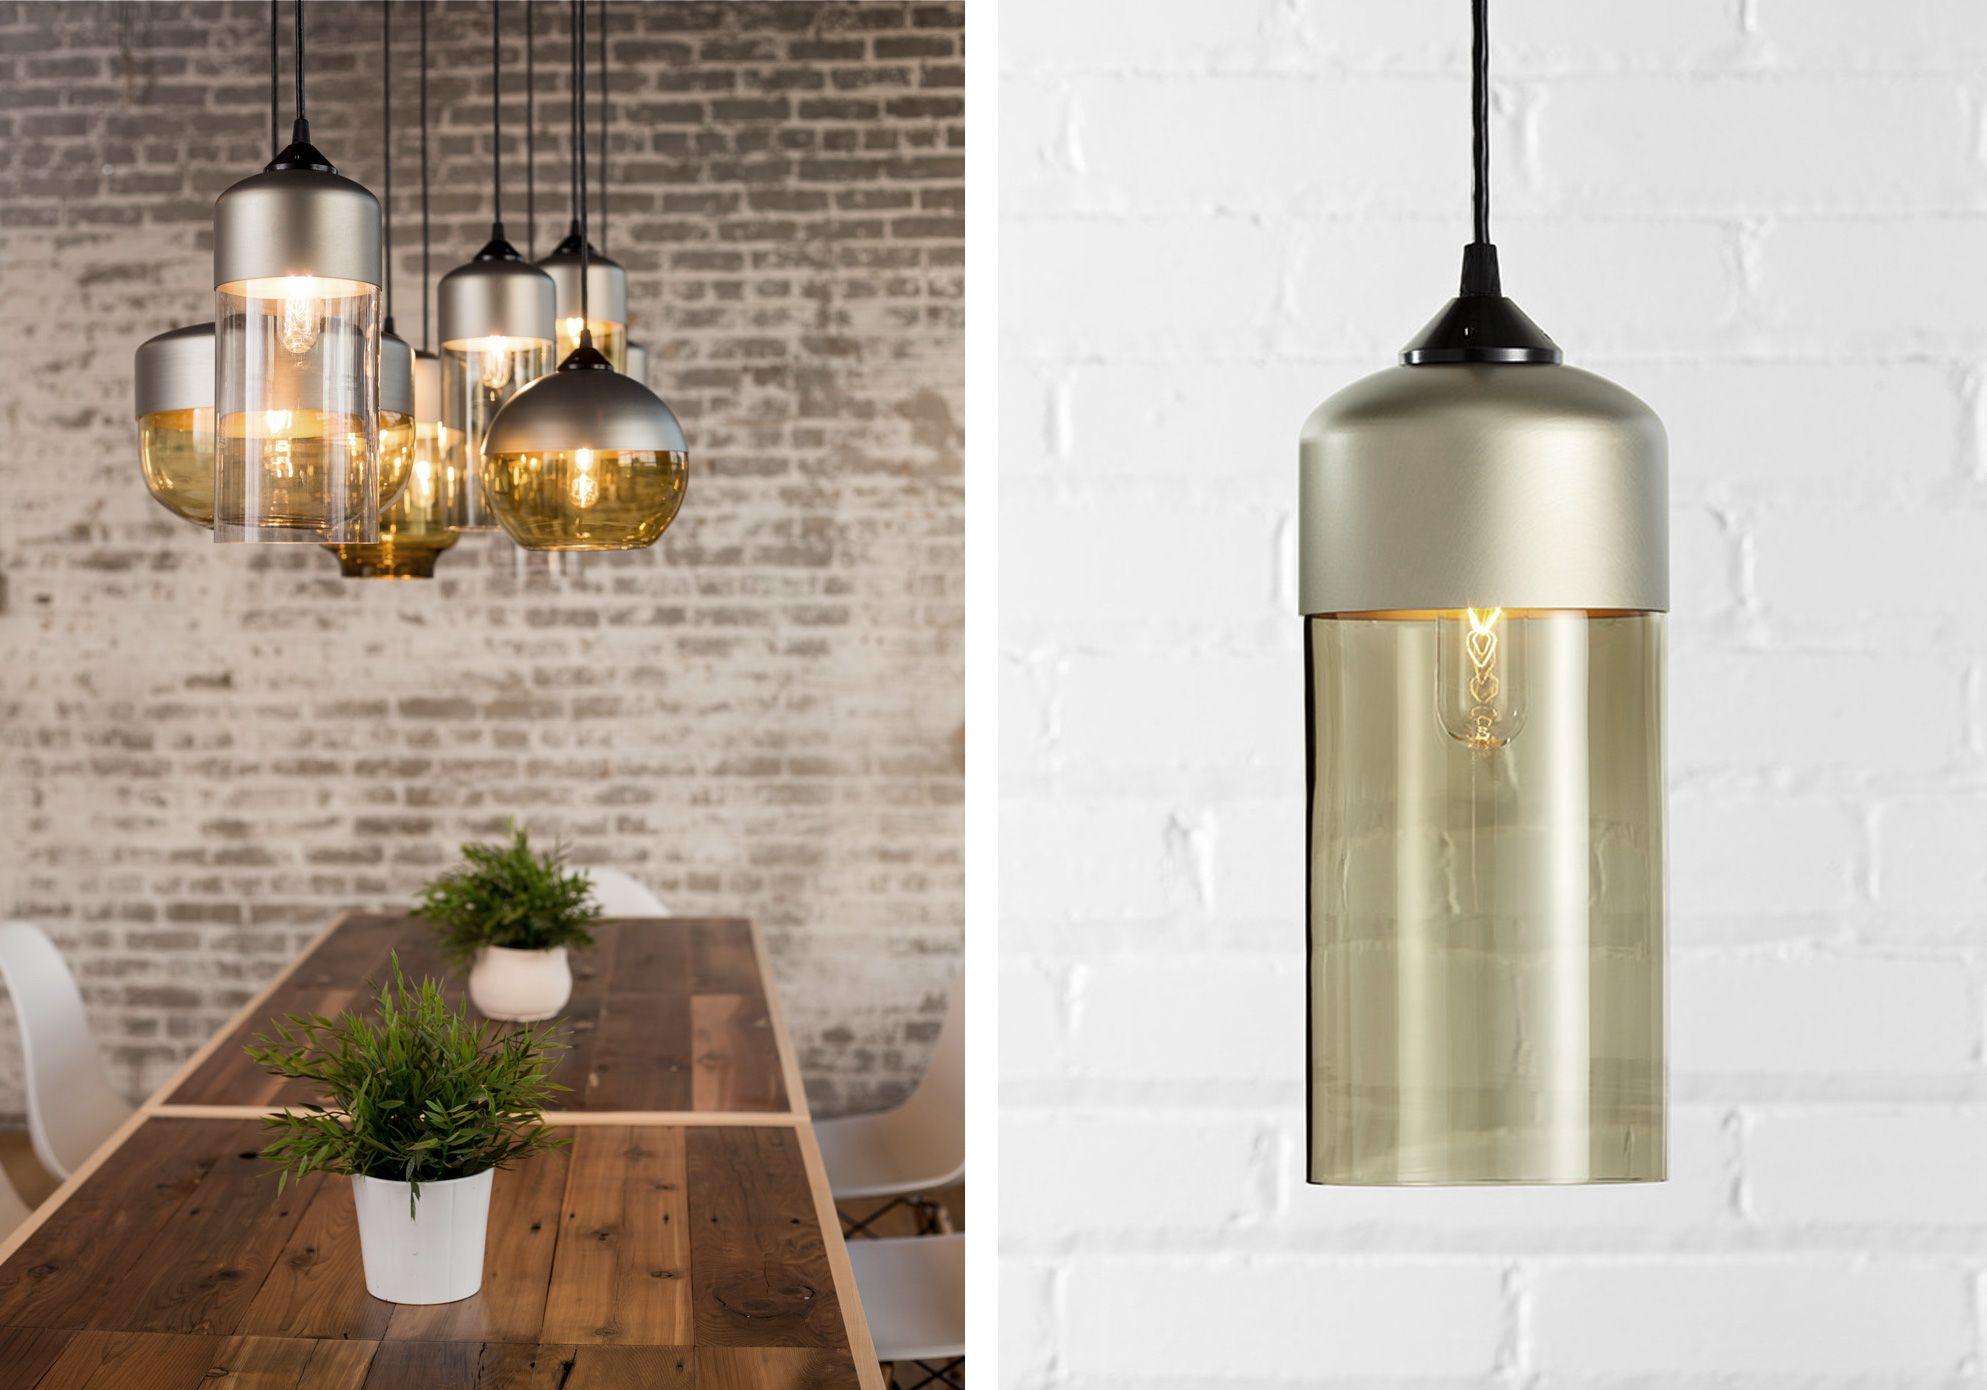 industrial chic lighting. Stunning Handmade Pendant Lights By Hennepin Made Industrial Chic Lighting D